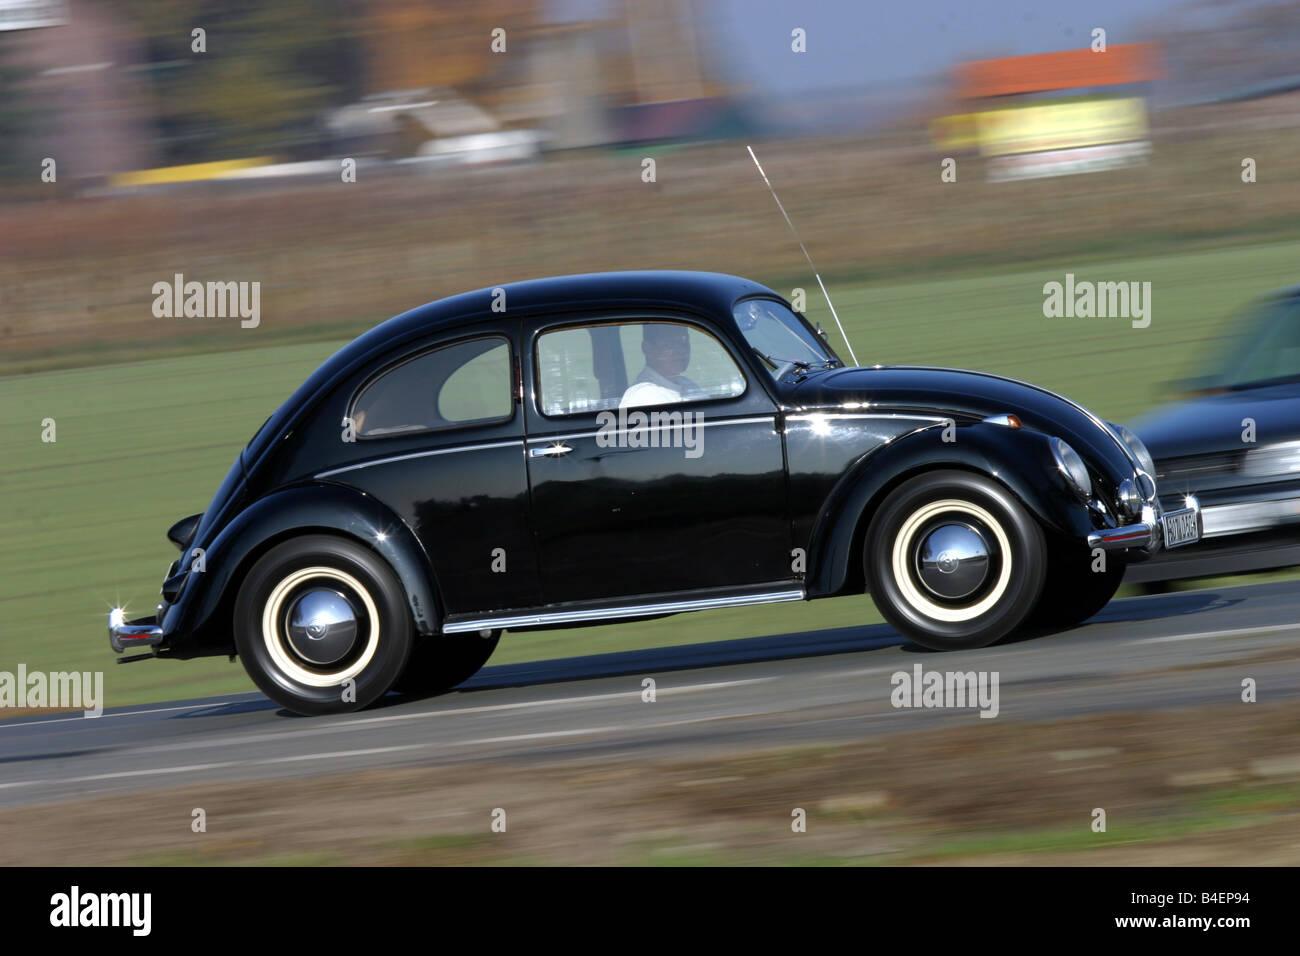 volkswagen black beetle. car, vw, volkswagen, pretzel beetle, model year 1949-1953, black, vintage 1940s, fourties, 1950s, fifties, driving, side v volkswagen black beetle